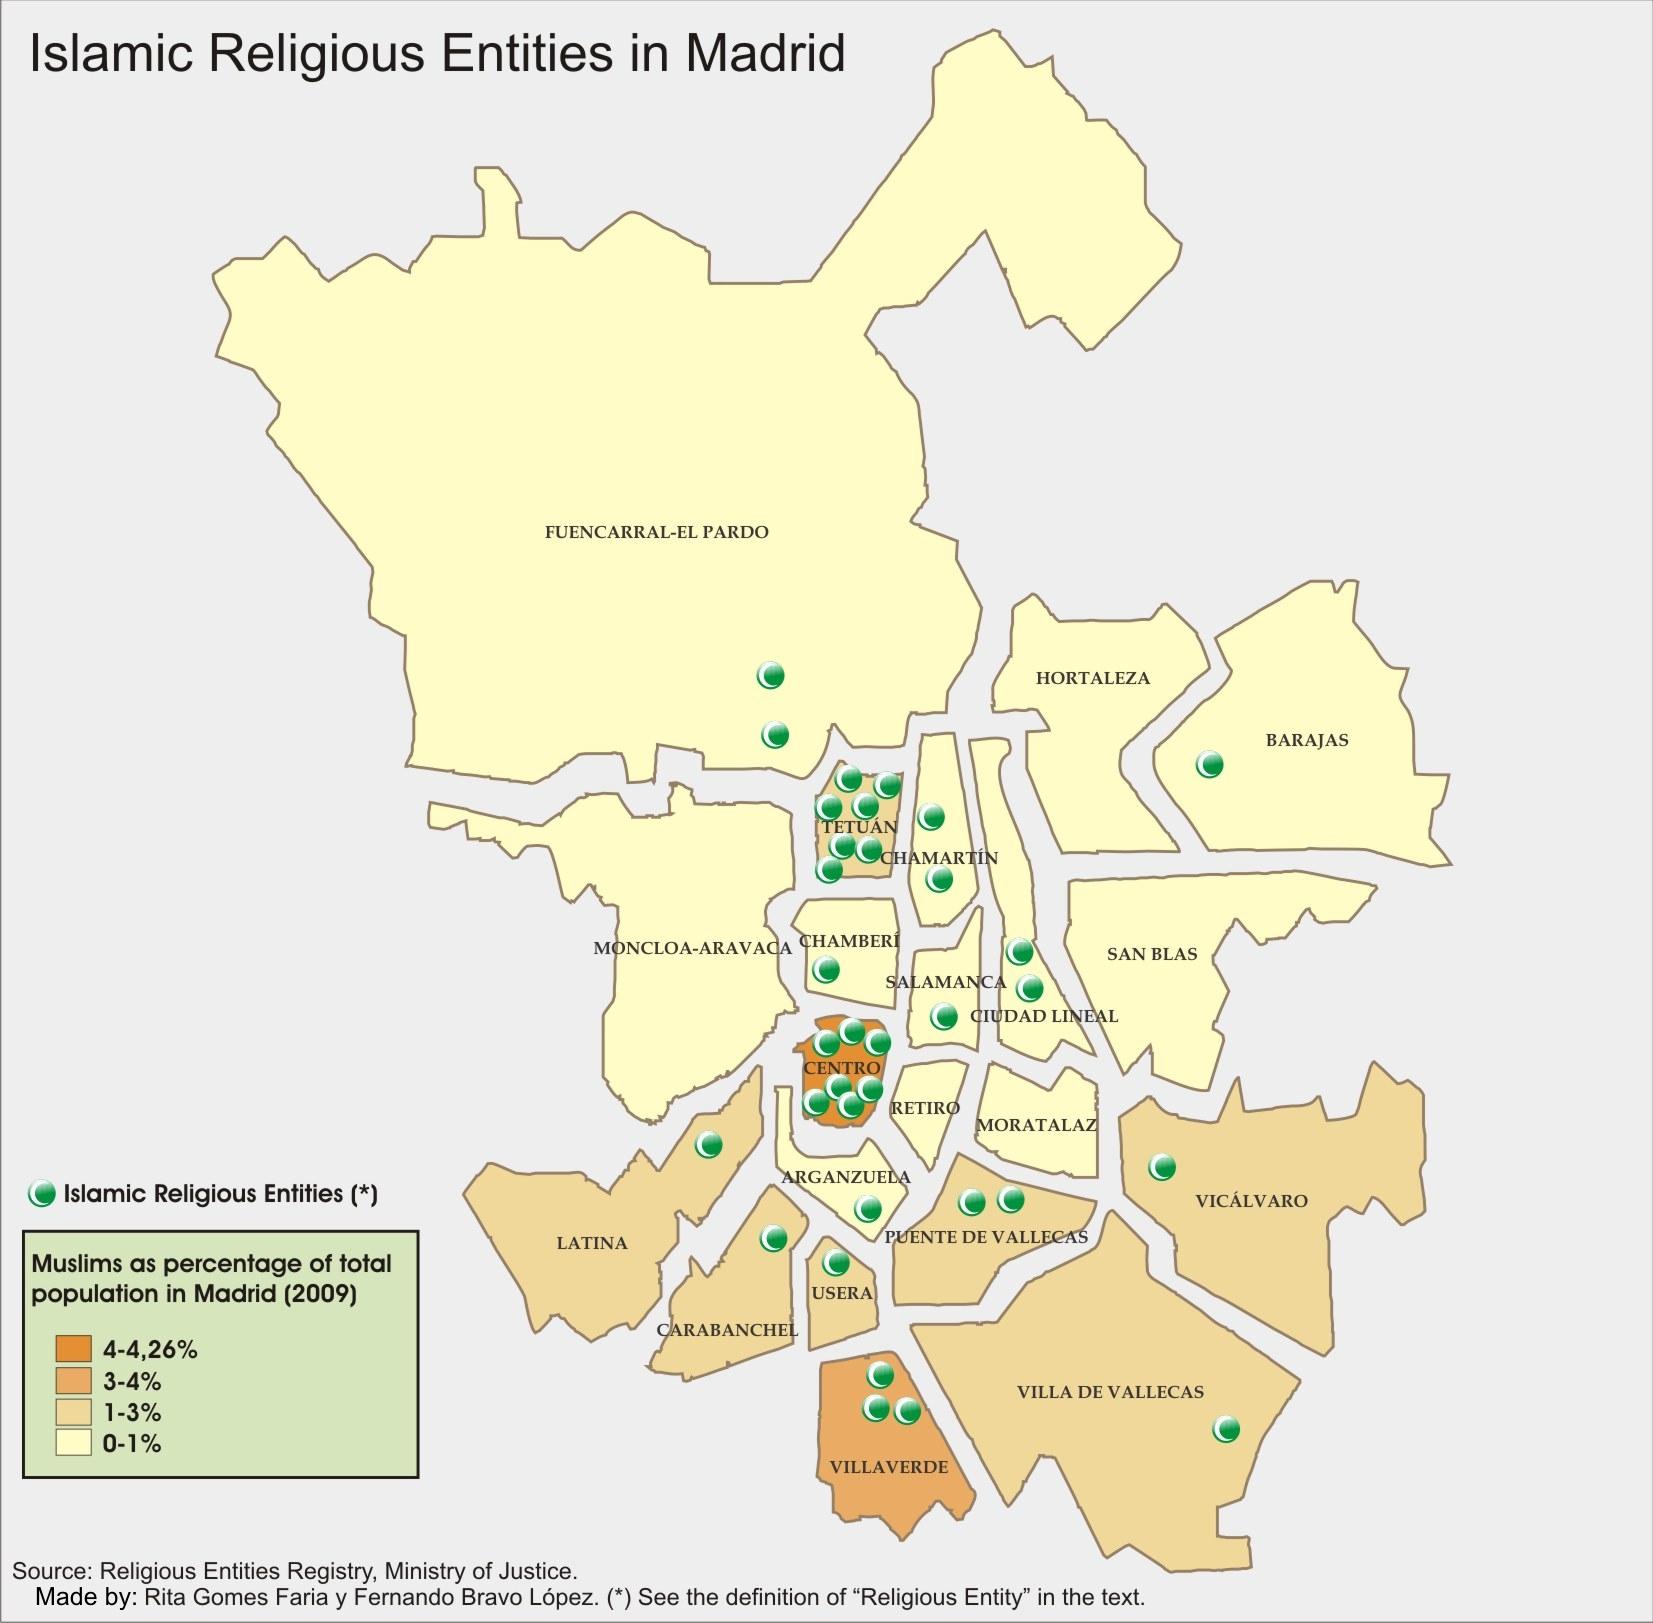 Islam in Madrid 2009